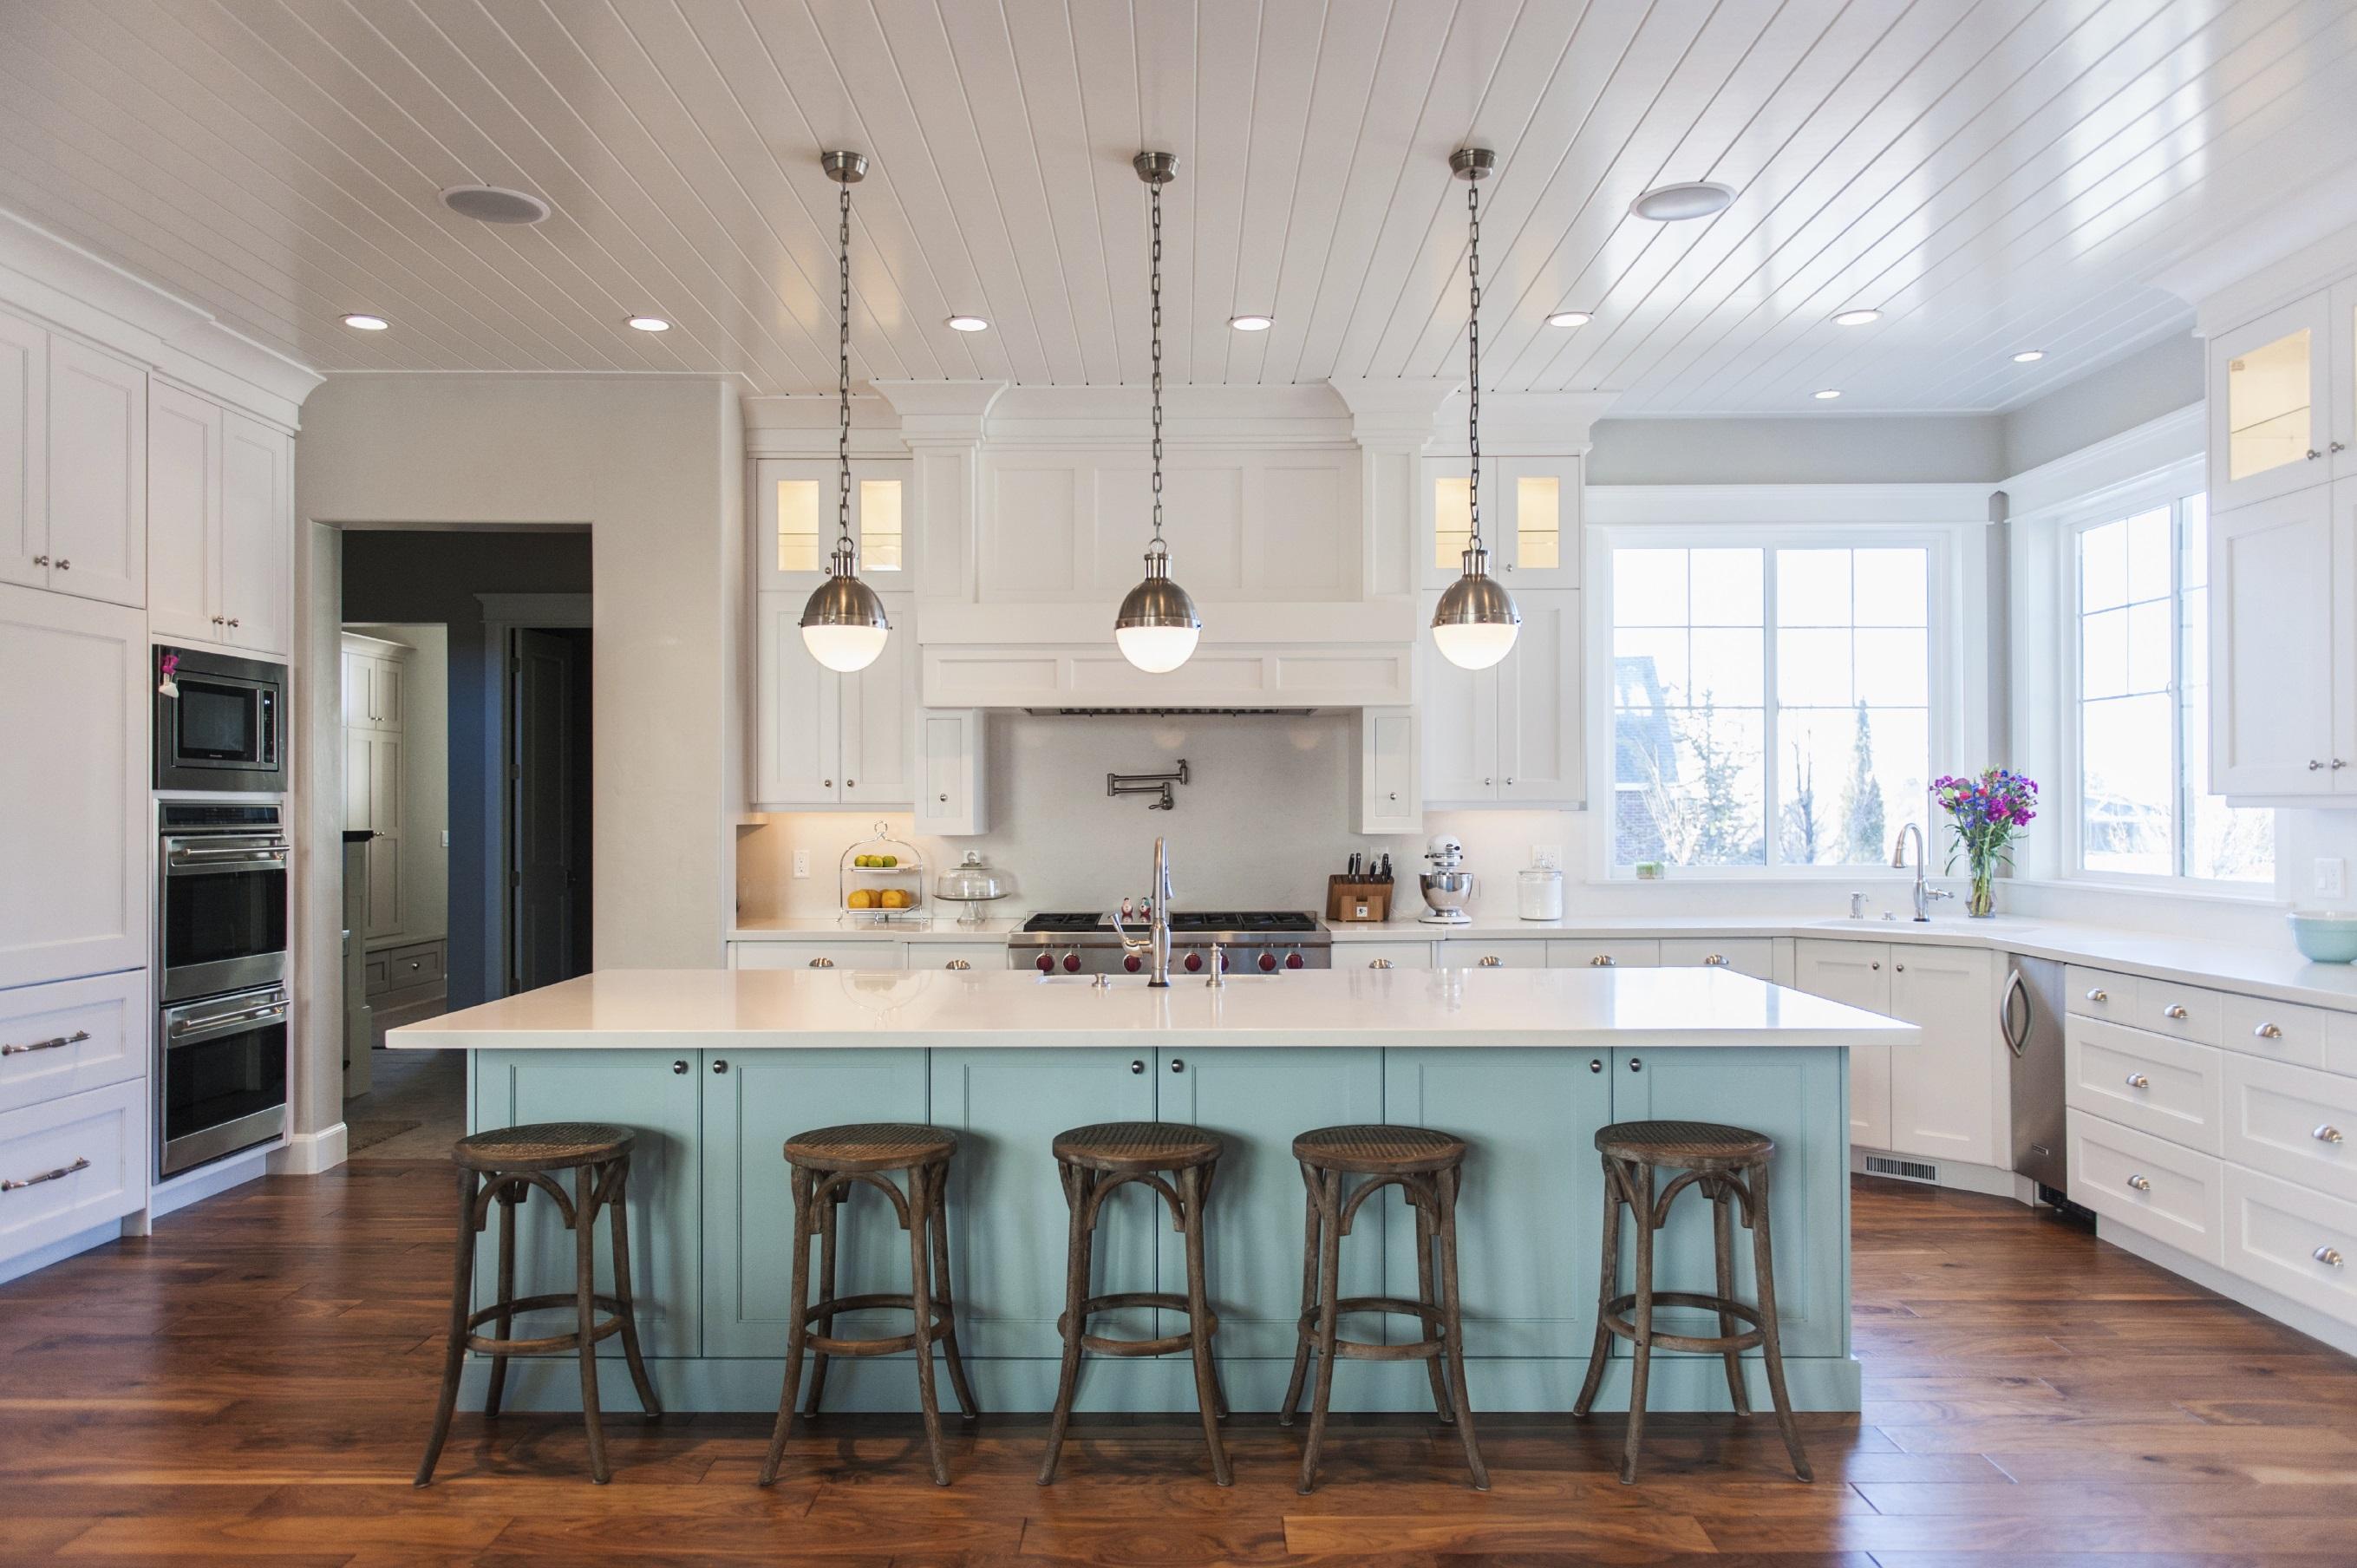 nice Kitchen Remodel Vancouver Wa #1: M5 Plumbing Services LLC